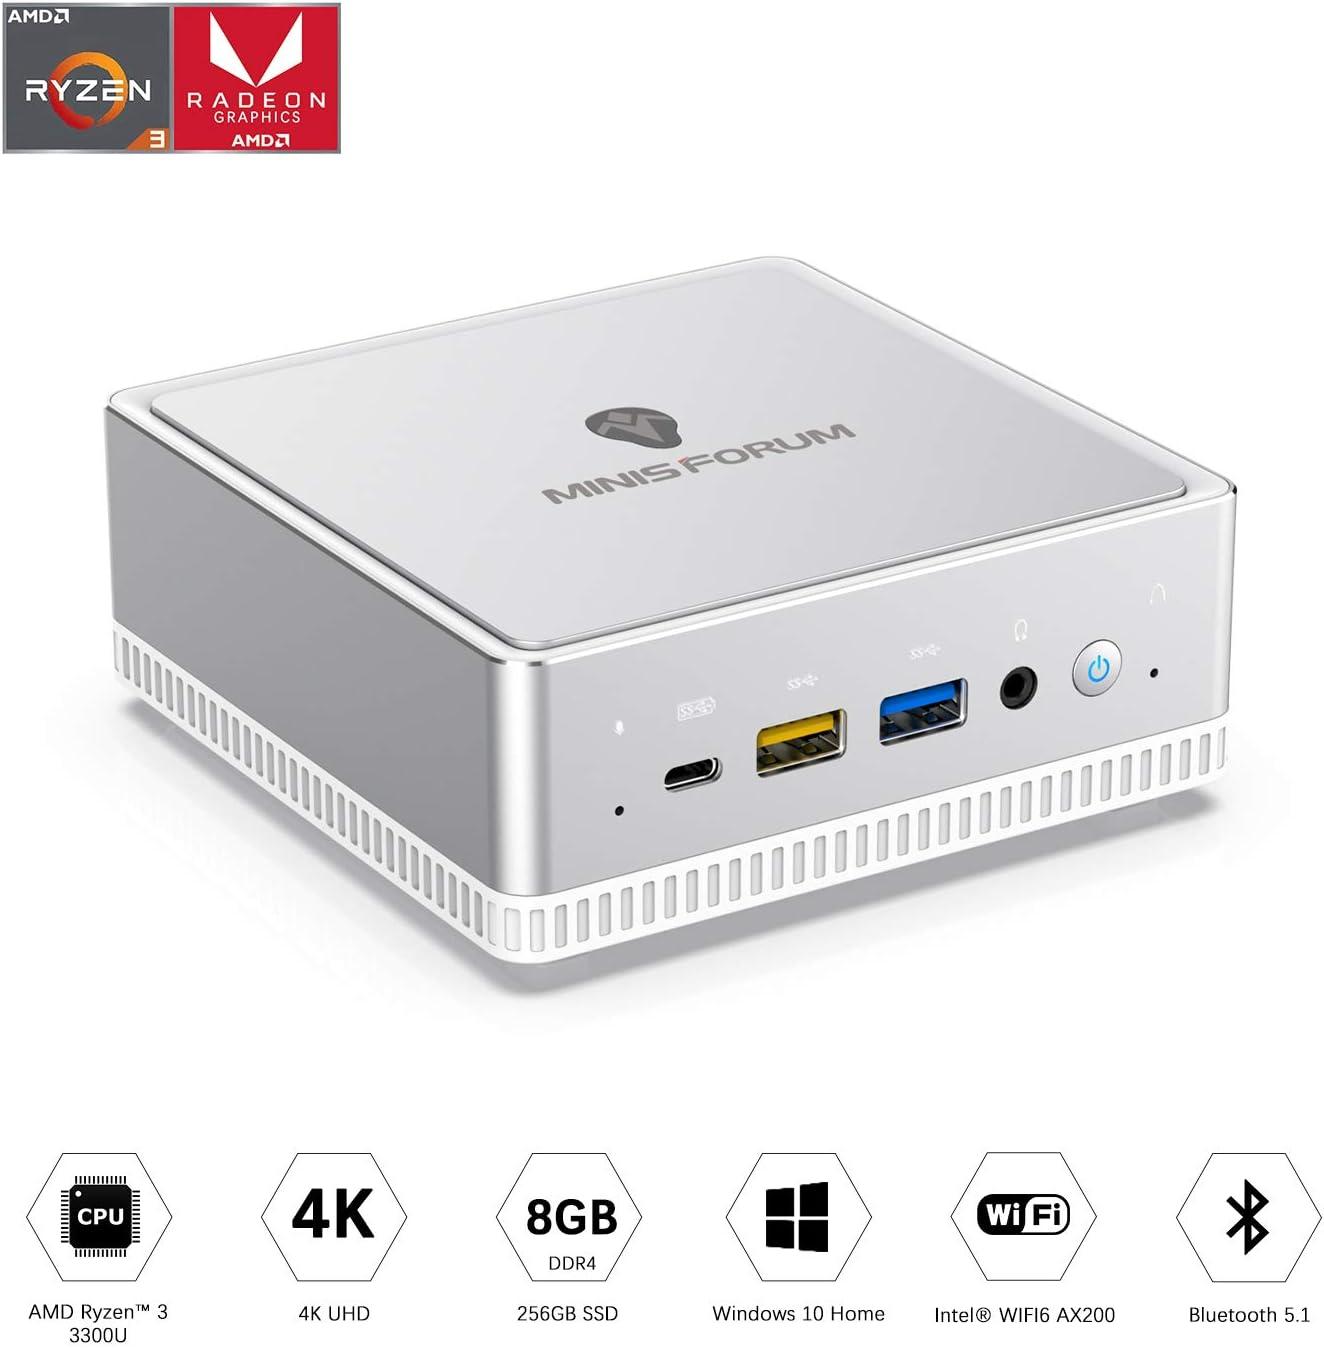 UM300 Mini PC AMD Ryzen 3 3300U Windows 10 Mini PC Desktop Computer, Radeon Vega 6 Graphics,8GB DDR4 256GB SSD,HDMI2.0/DP/USB-C Triple 4K@60Hz Output,with1000M LAN Intel WIFI6 AX200 BT5.1